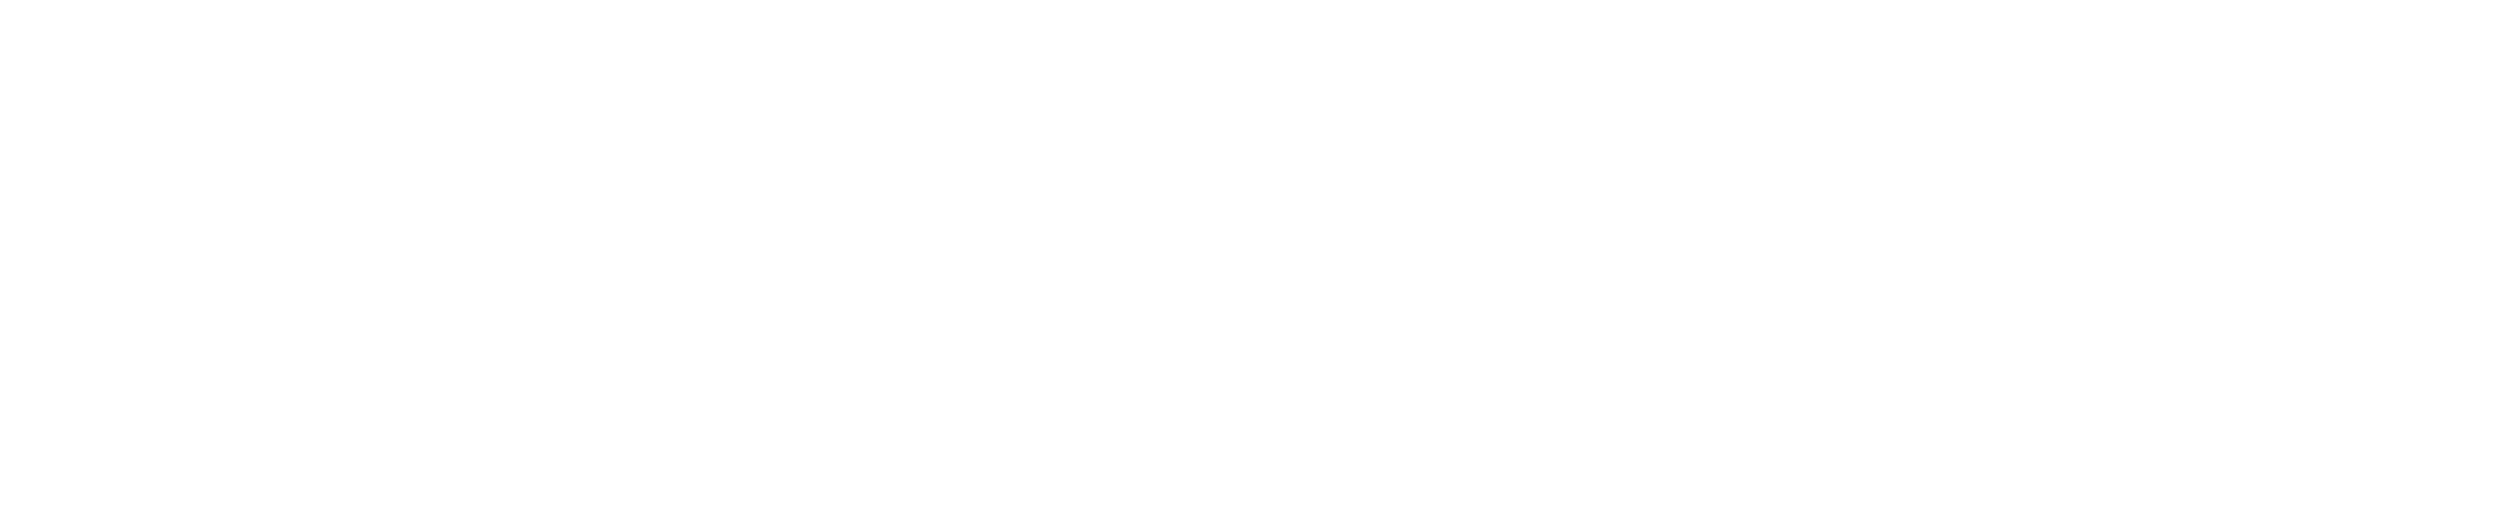 1-on-1-powerlifting-coaching.png